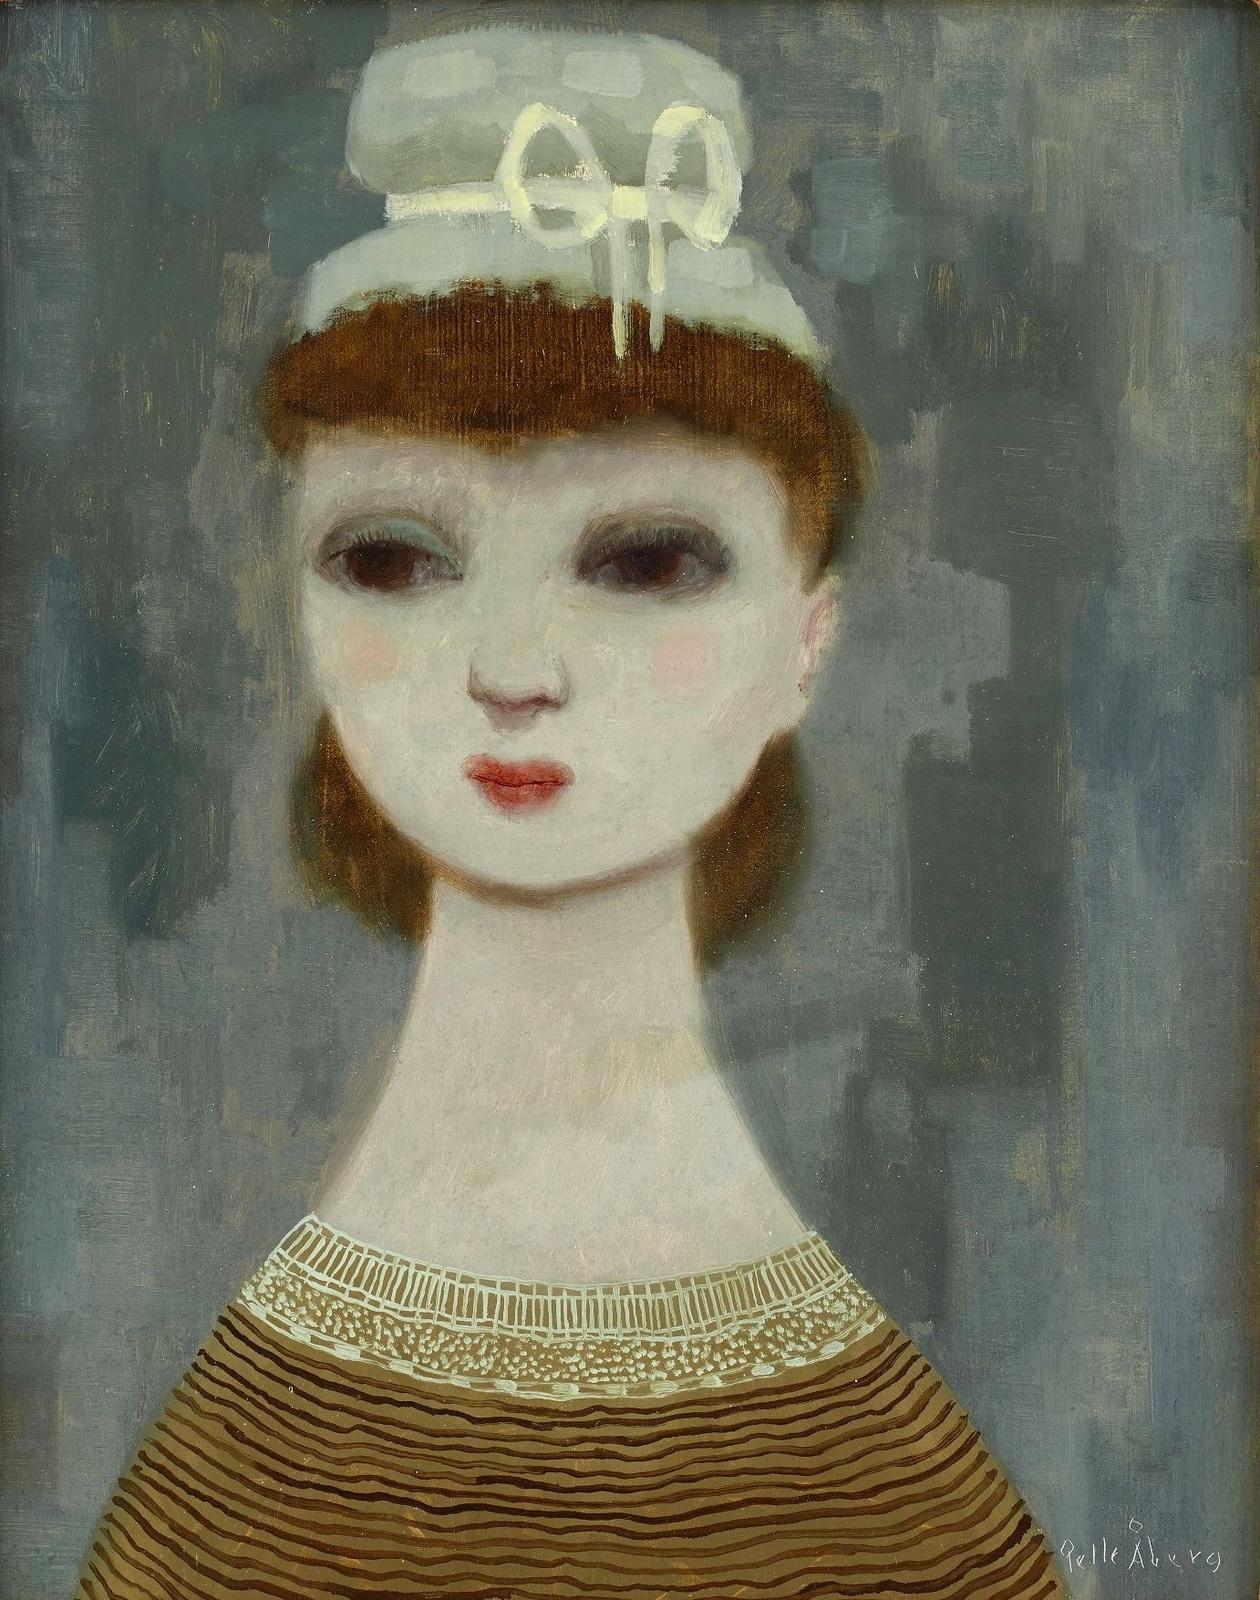 Девушка в свтло-зеленой шляпе (The girl with the light green hat)_40 х 32_д.,м._Частное собрание.jpg